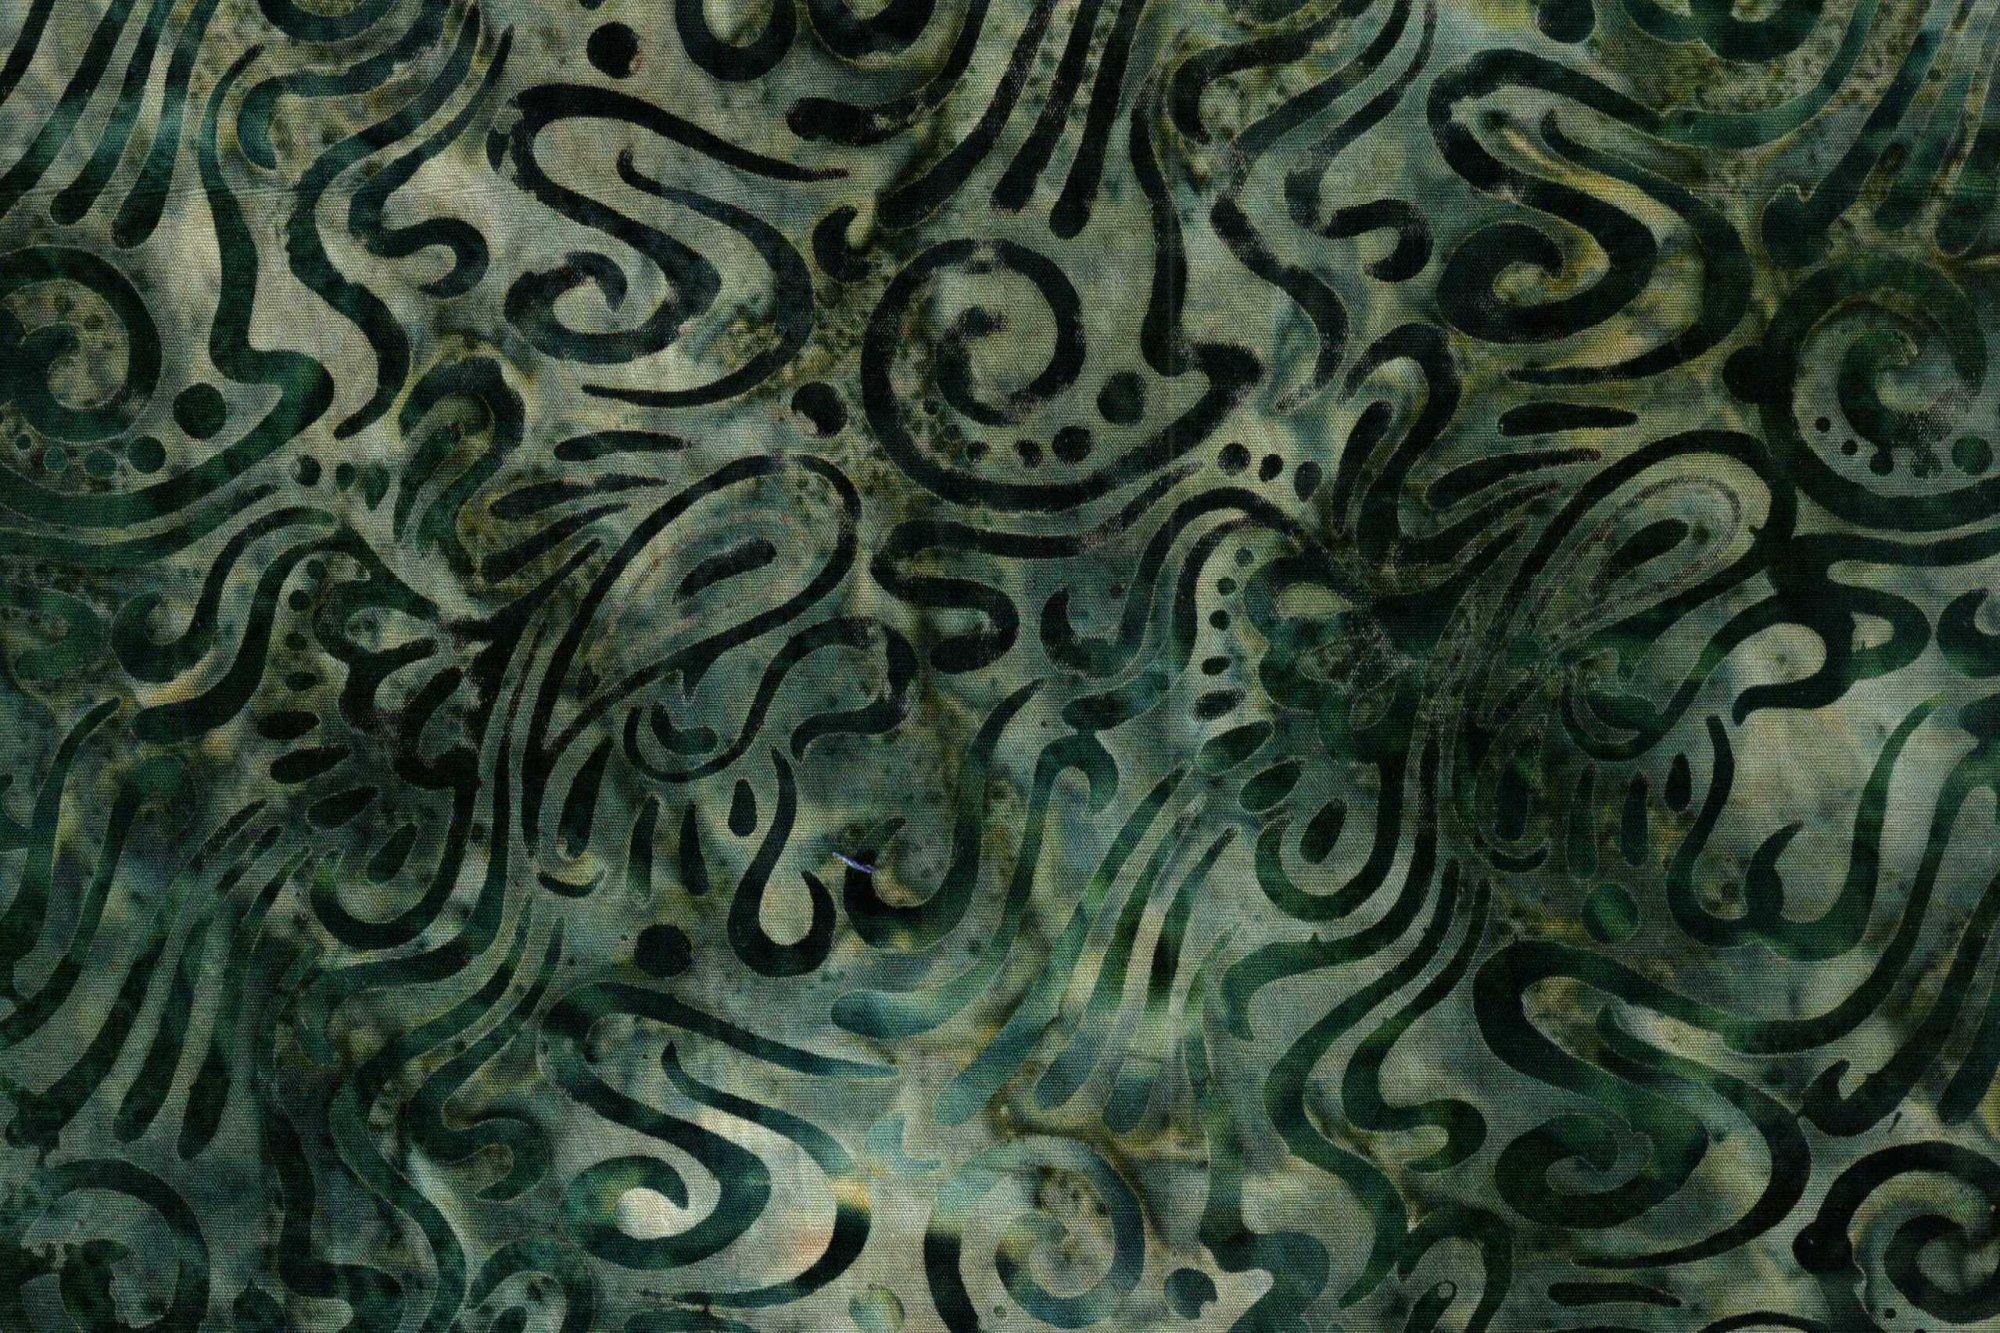 Batik 4300 Swirl 334 Green/Grey